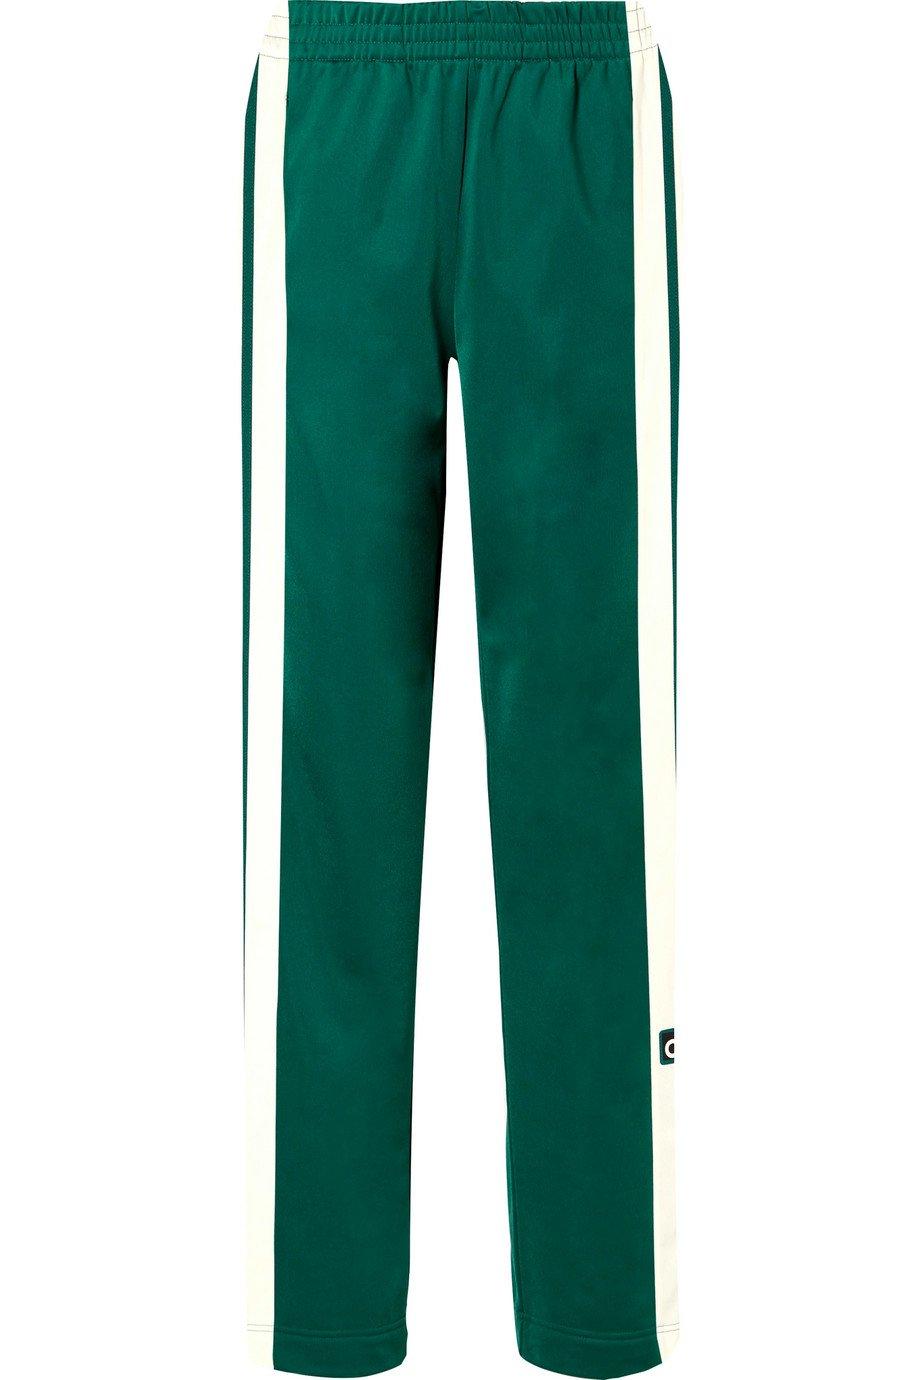 adidas Originals   Adibreak striped satin-jersey track pants   NET-A-PORTER.COM